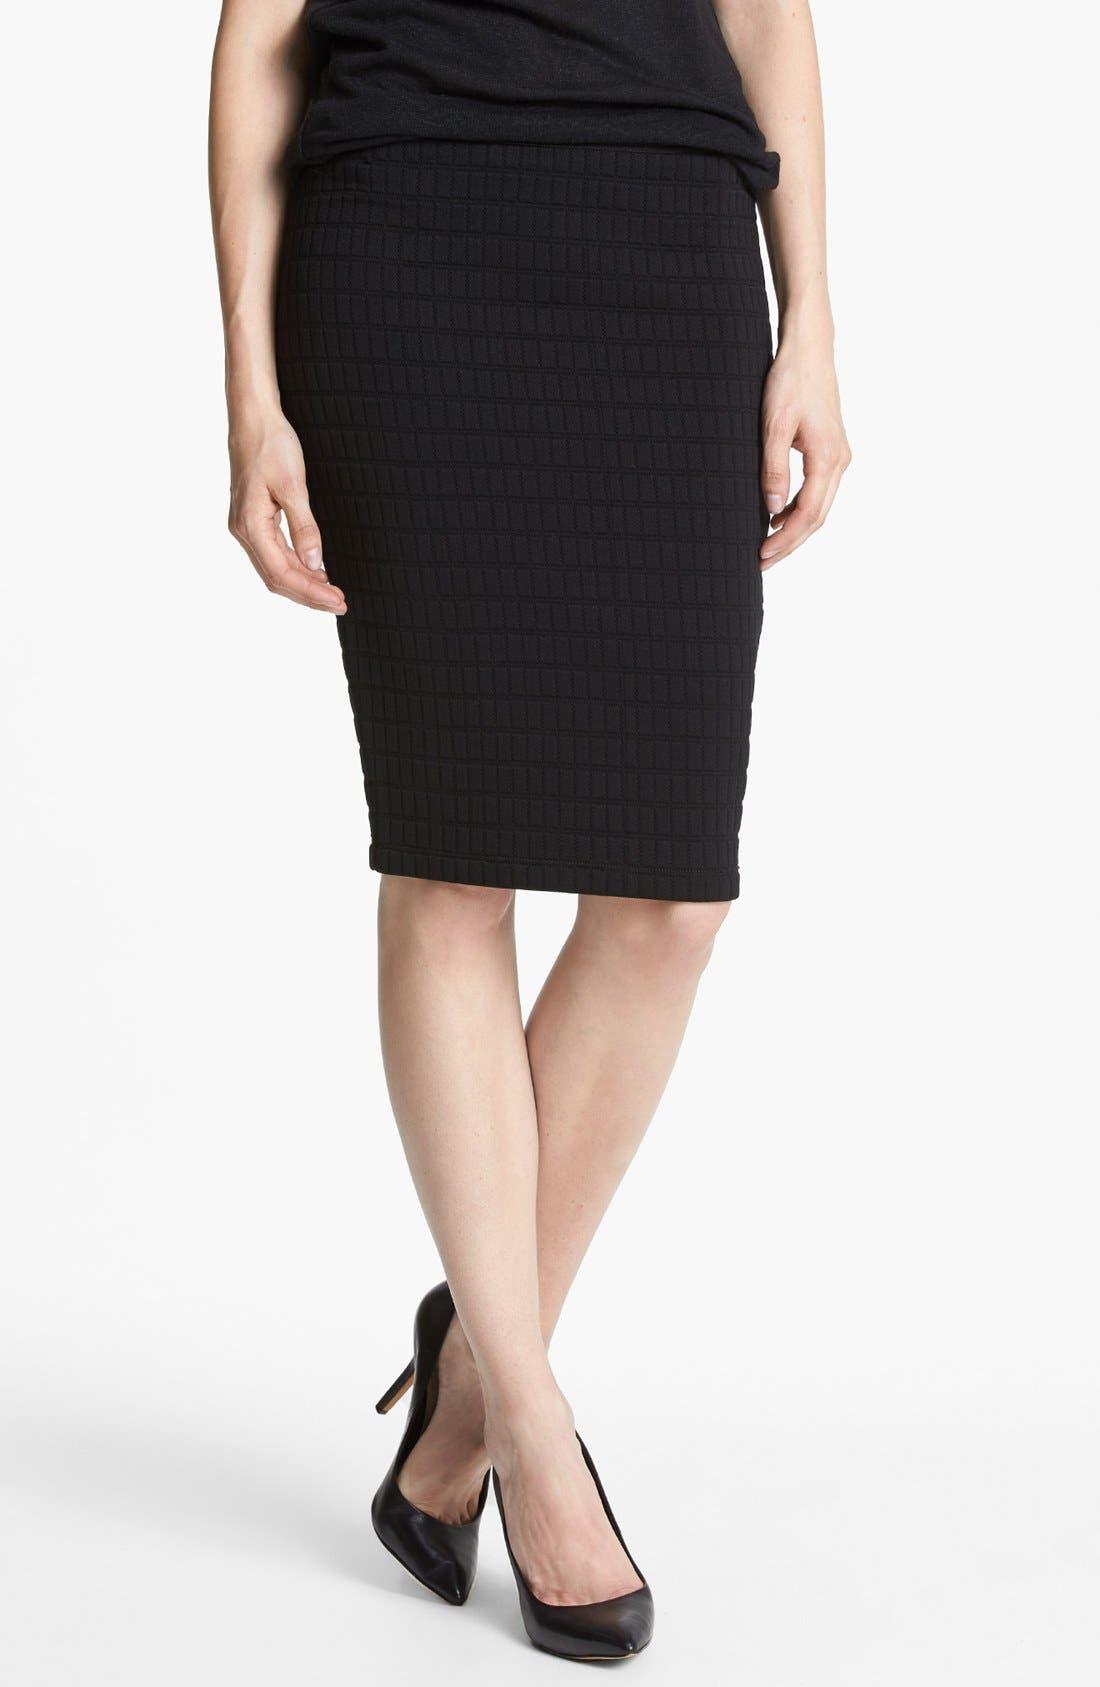 Main Image - Bailey 44 'Scanner' Textured Pencil Skirt